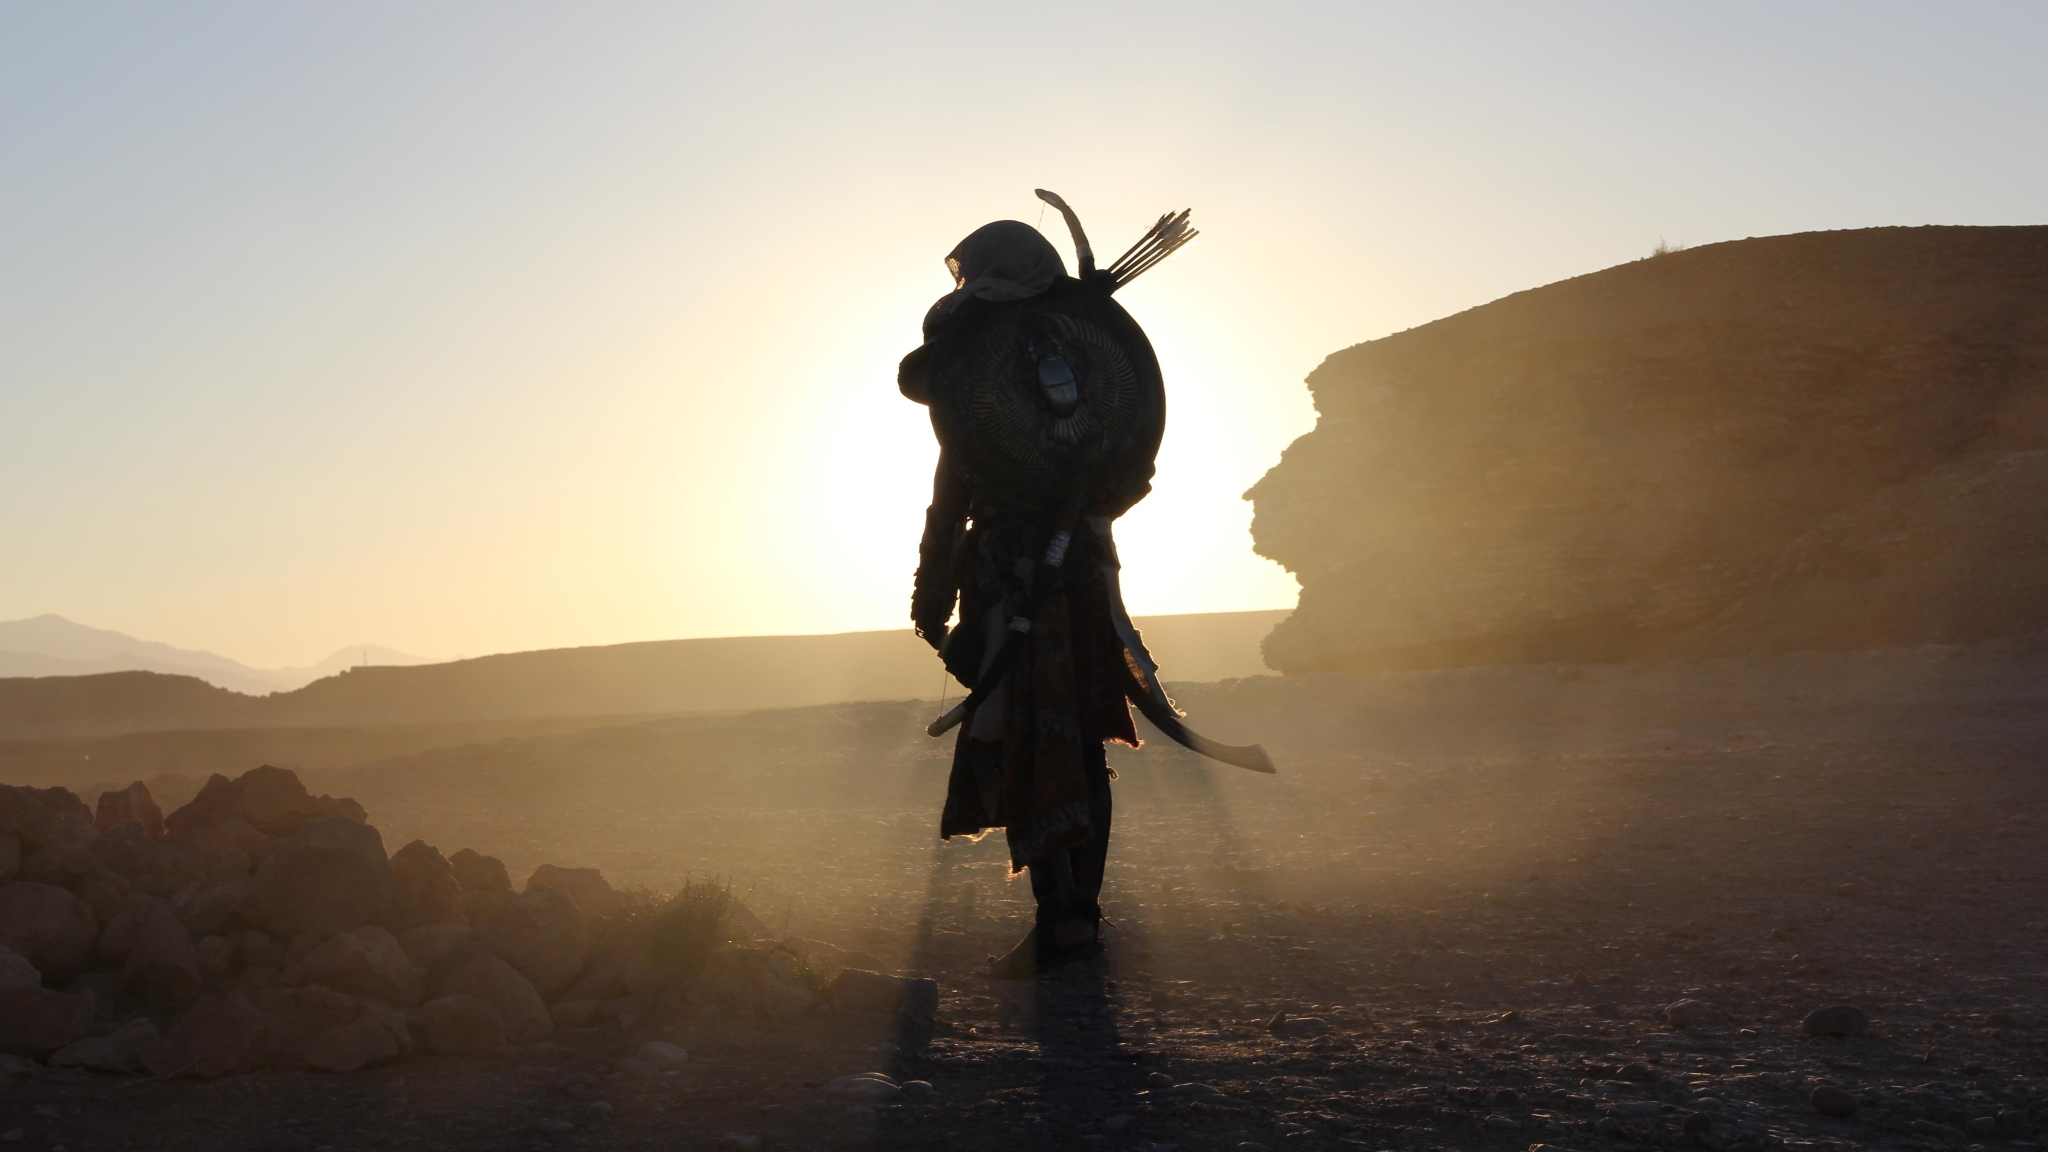 Download Assassins Creed Origins Game 2048x1152 Resolution